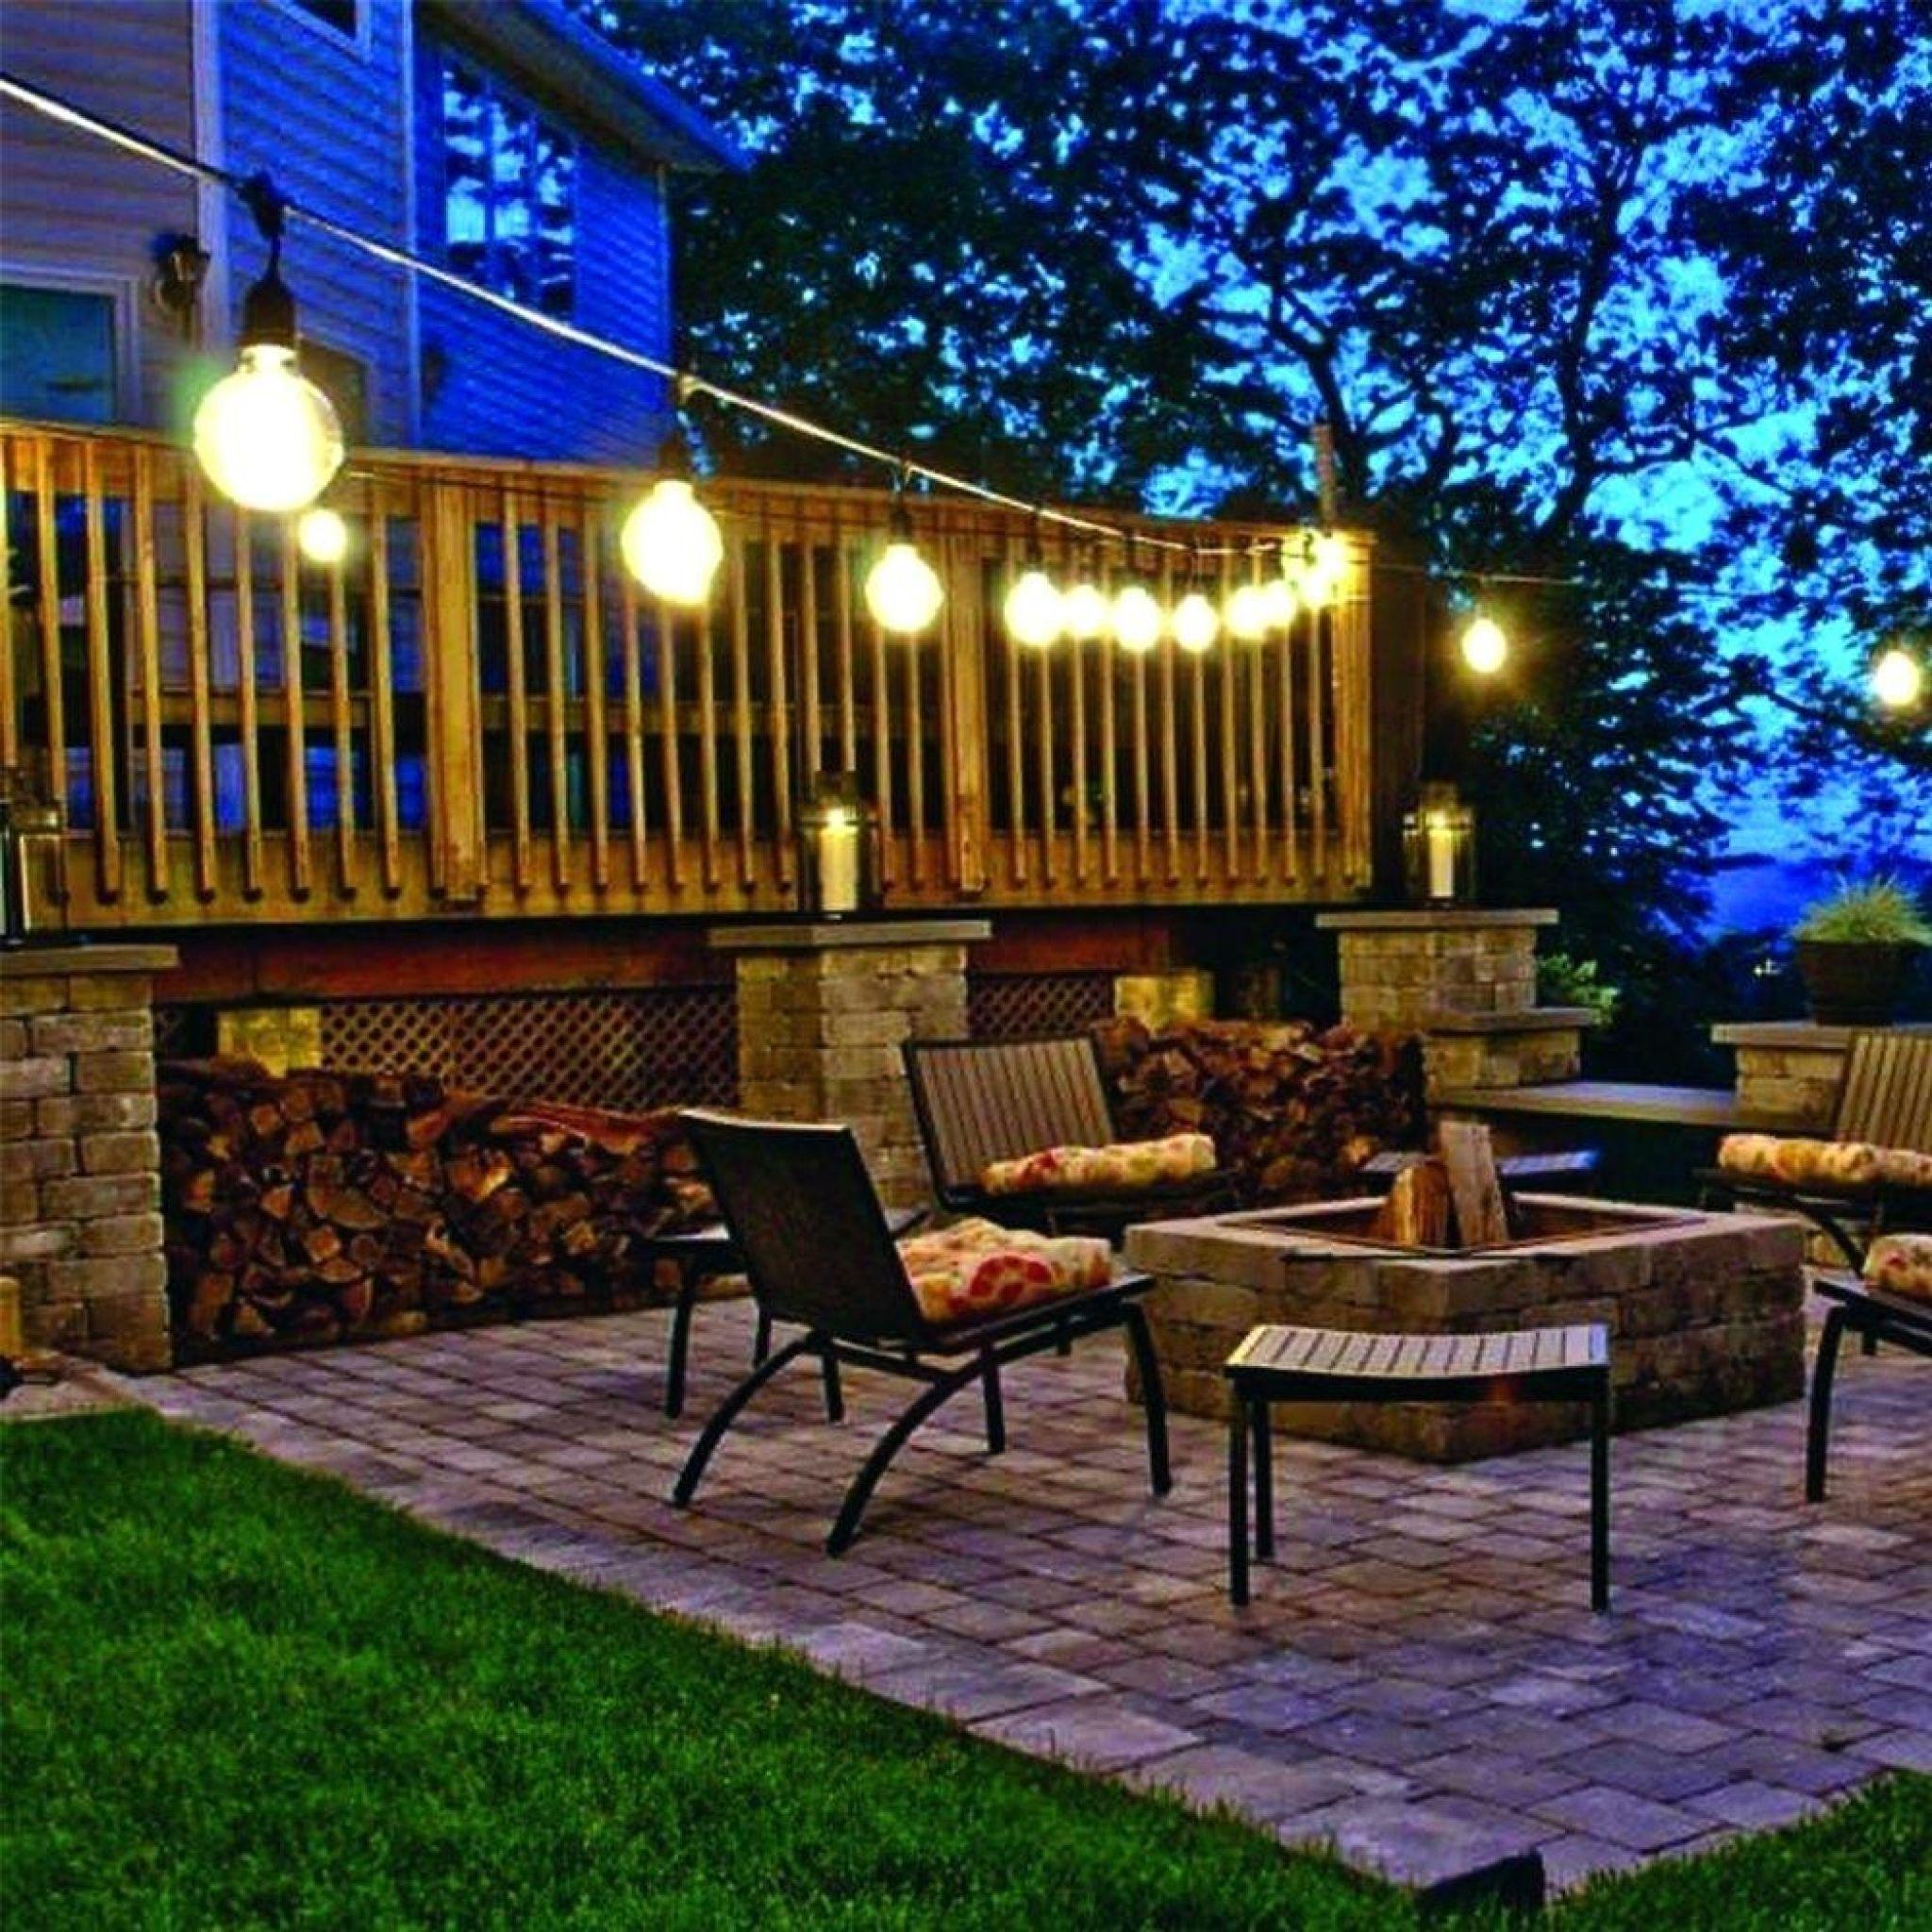 Solar powered string lights outdoor interior paint color ideas solar powered string lights outdoor interior paint color ideas check more at http aloadofball Choice Image